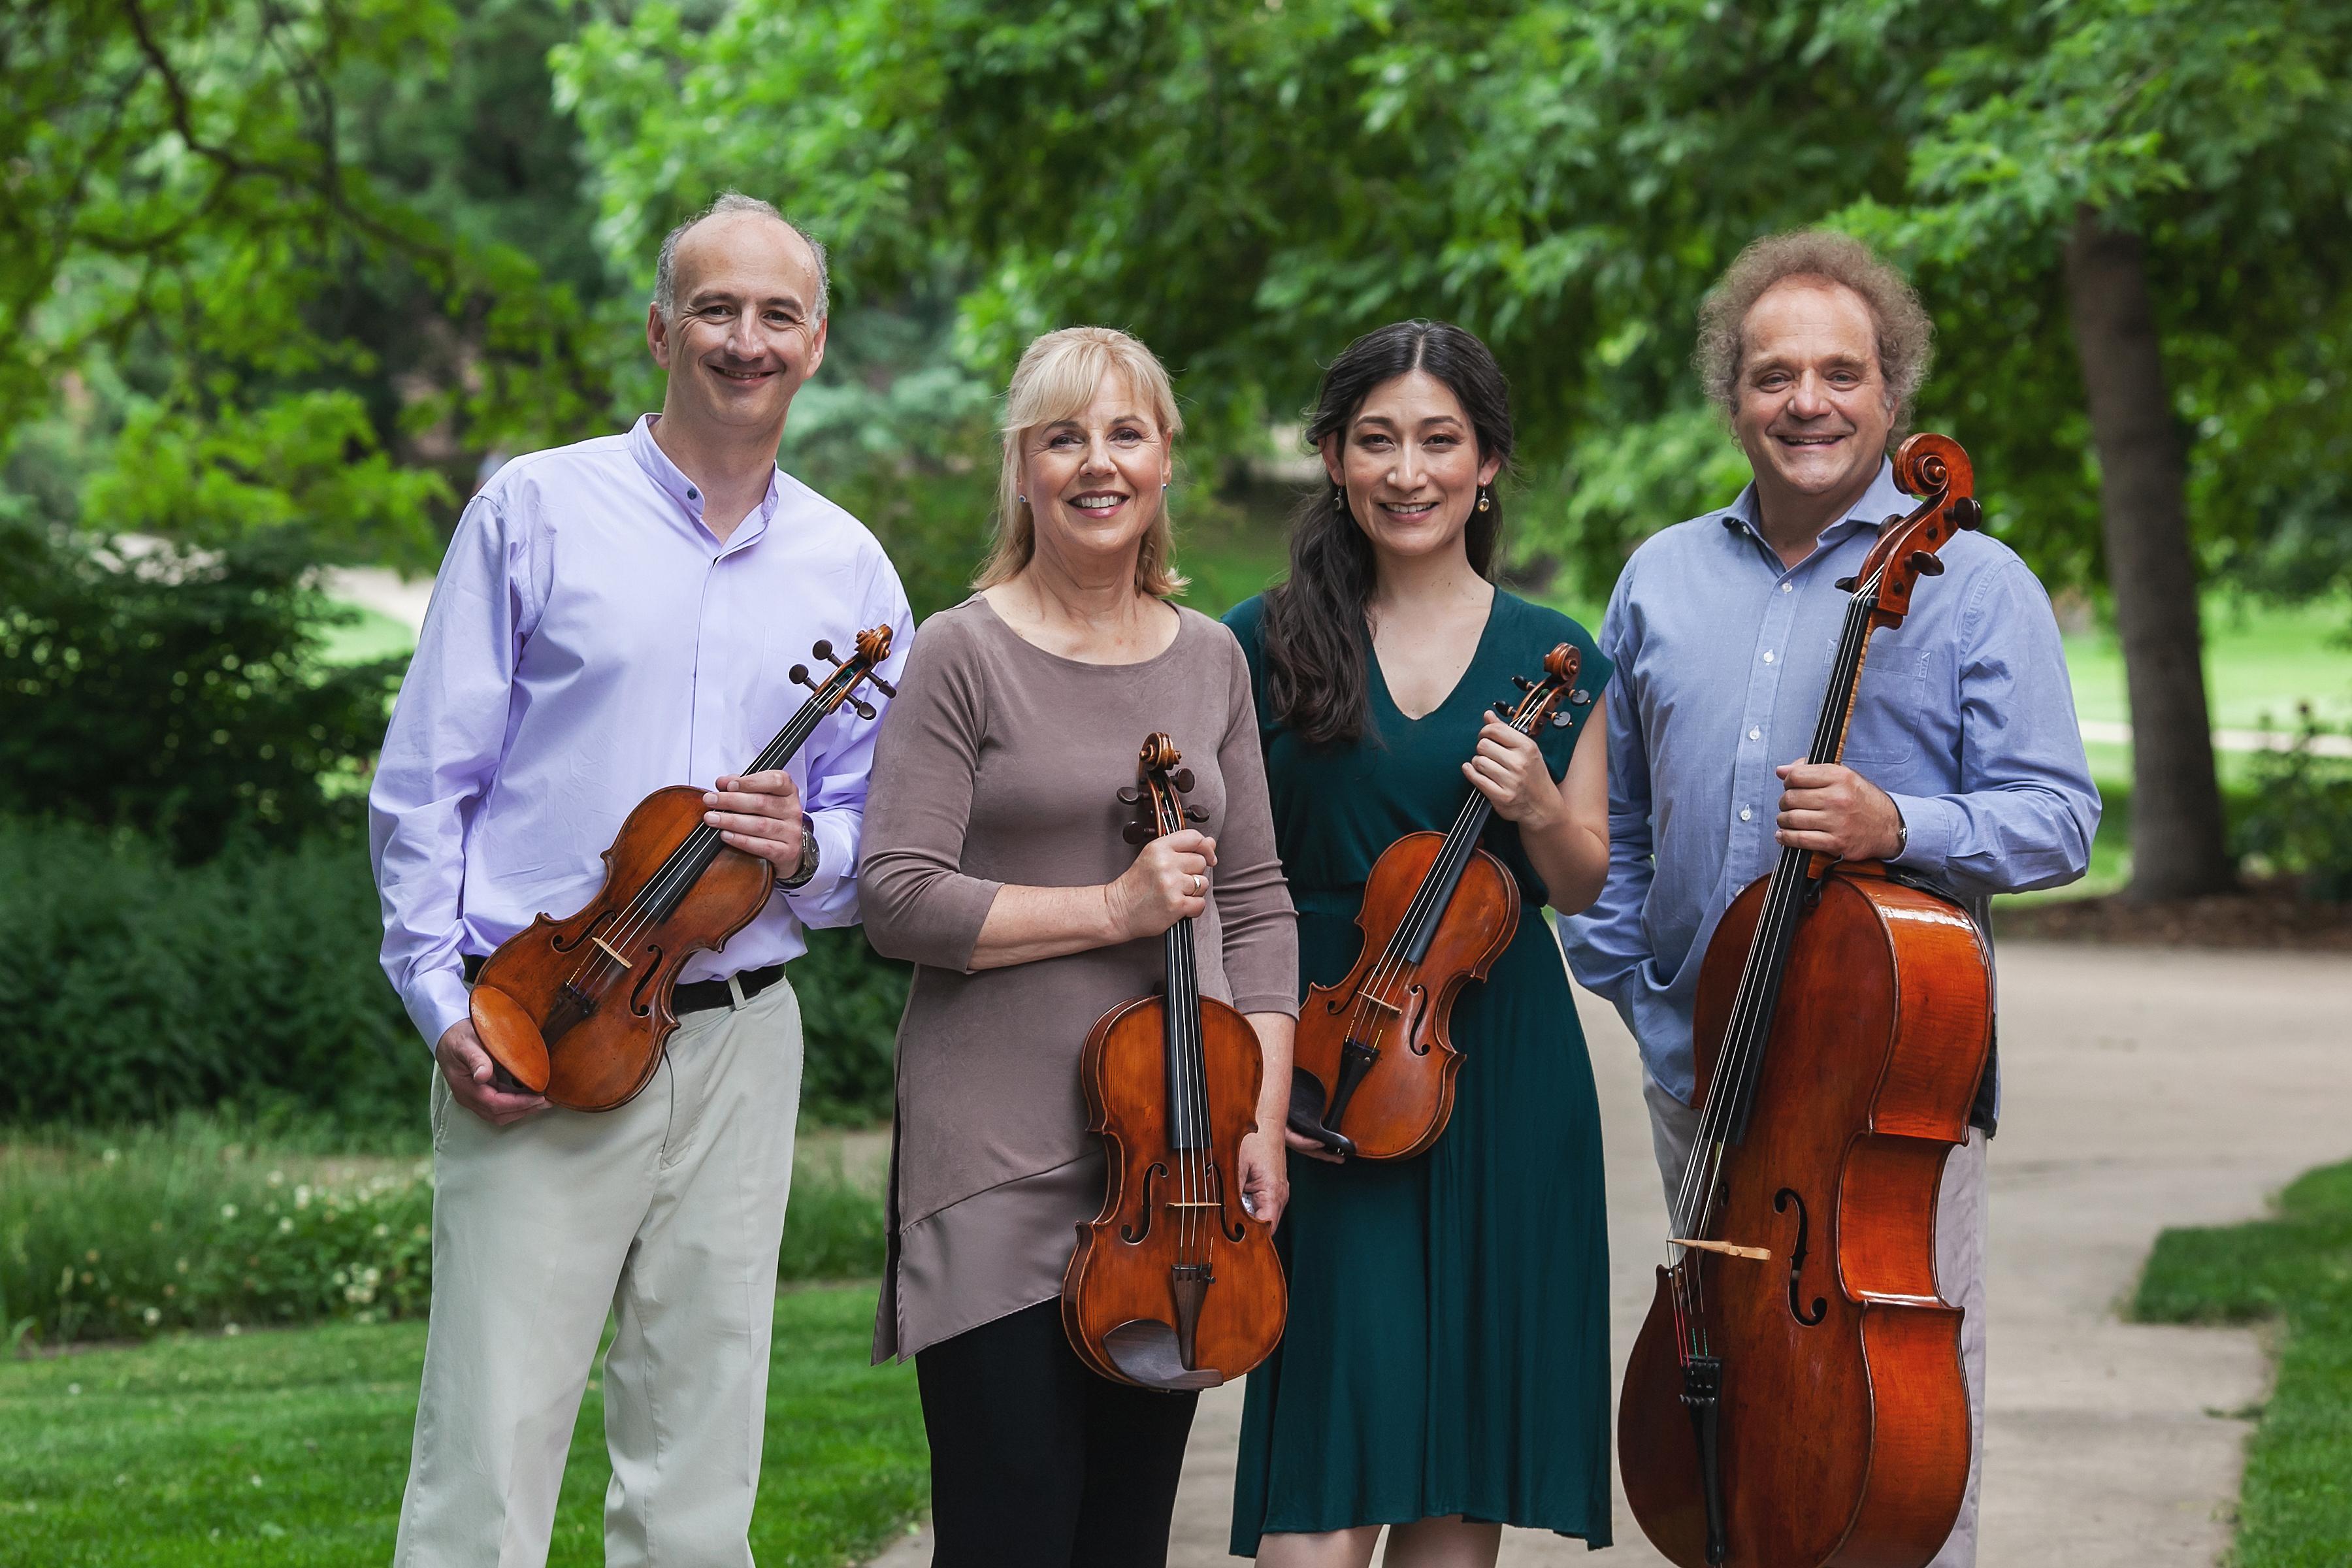 09-Takacs-Quartet-Amanda-Tipton-photography.jpg